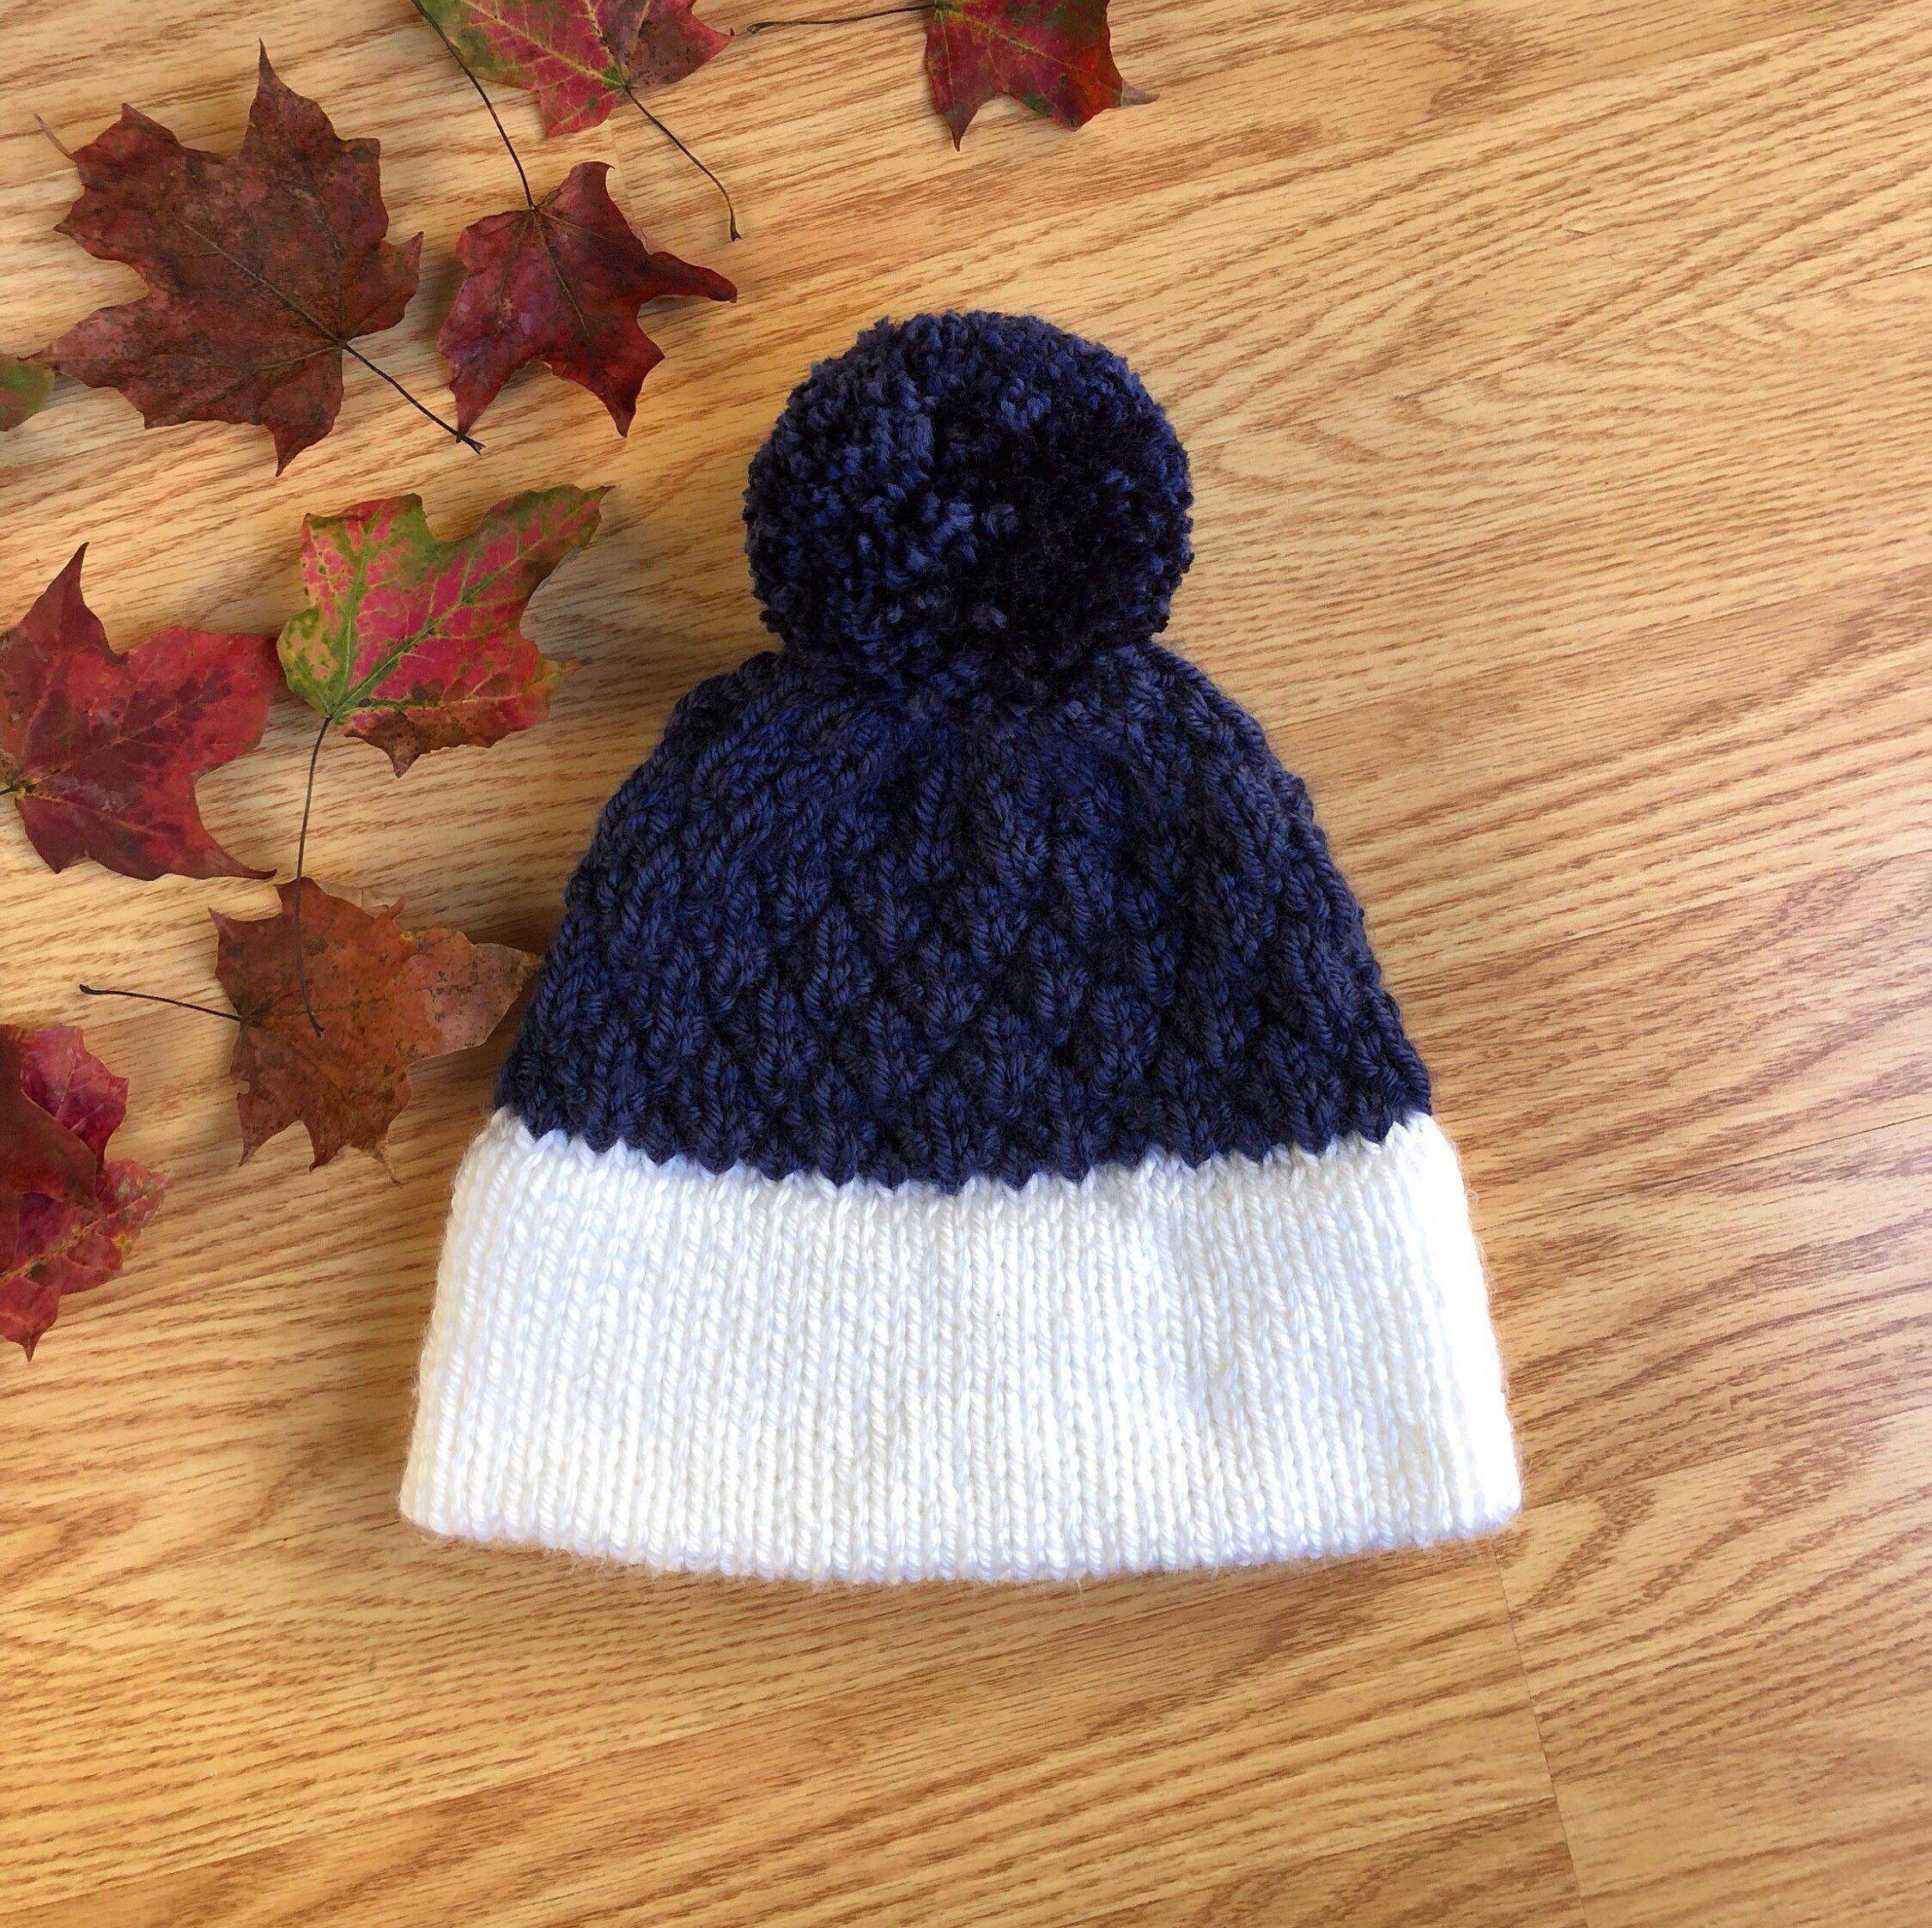 7147882cea9f44 Irinda beanie - double brim adult beanie - winter cozy hat - double brim  blue hat - double brim hat